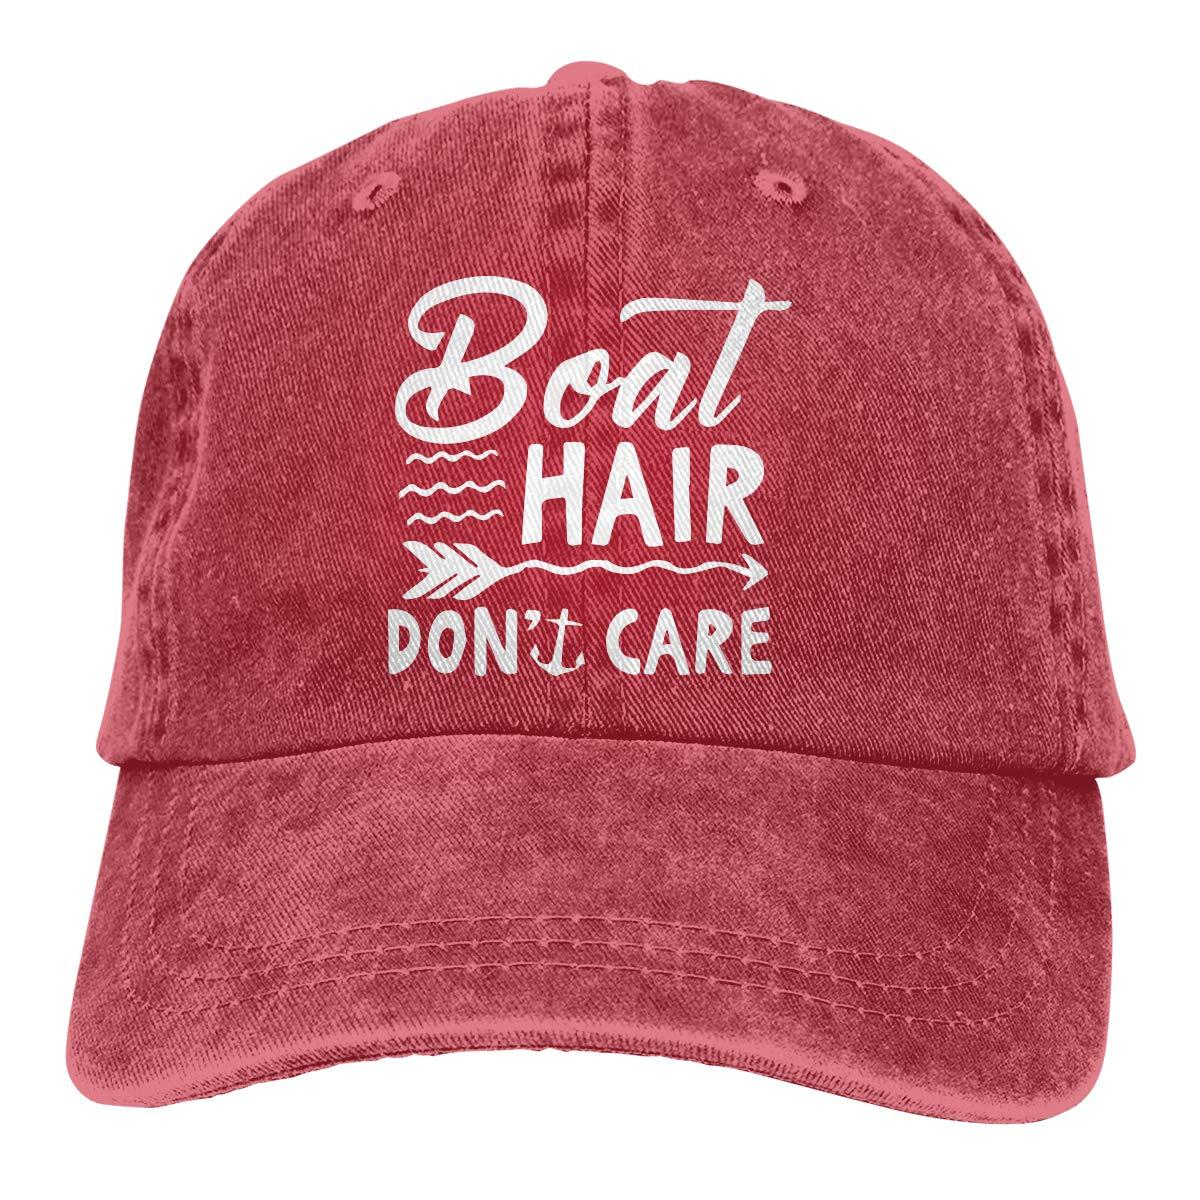 9e6d1408440b8 Boat Hair Don t Care Design Vintage Fashion Men   Women Adjustable Jeans  Dad Hat Cotton Baseball Cap Black at Amazon Men s Clothing store